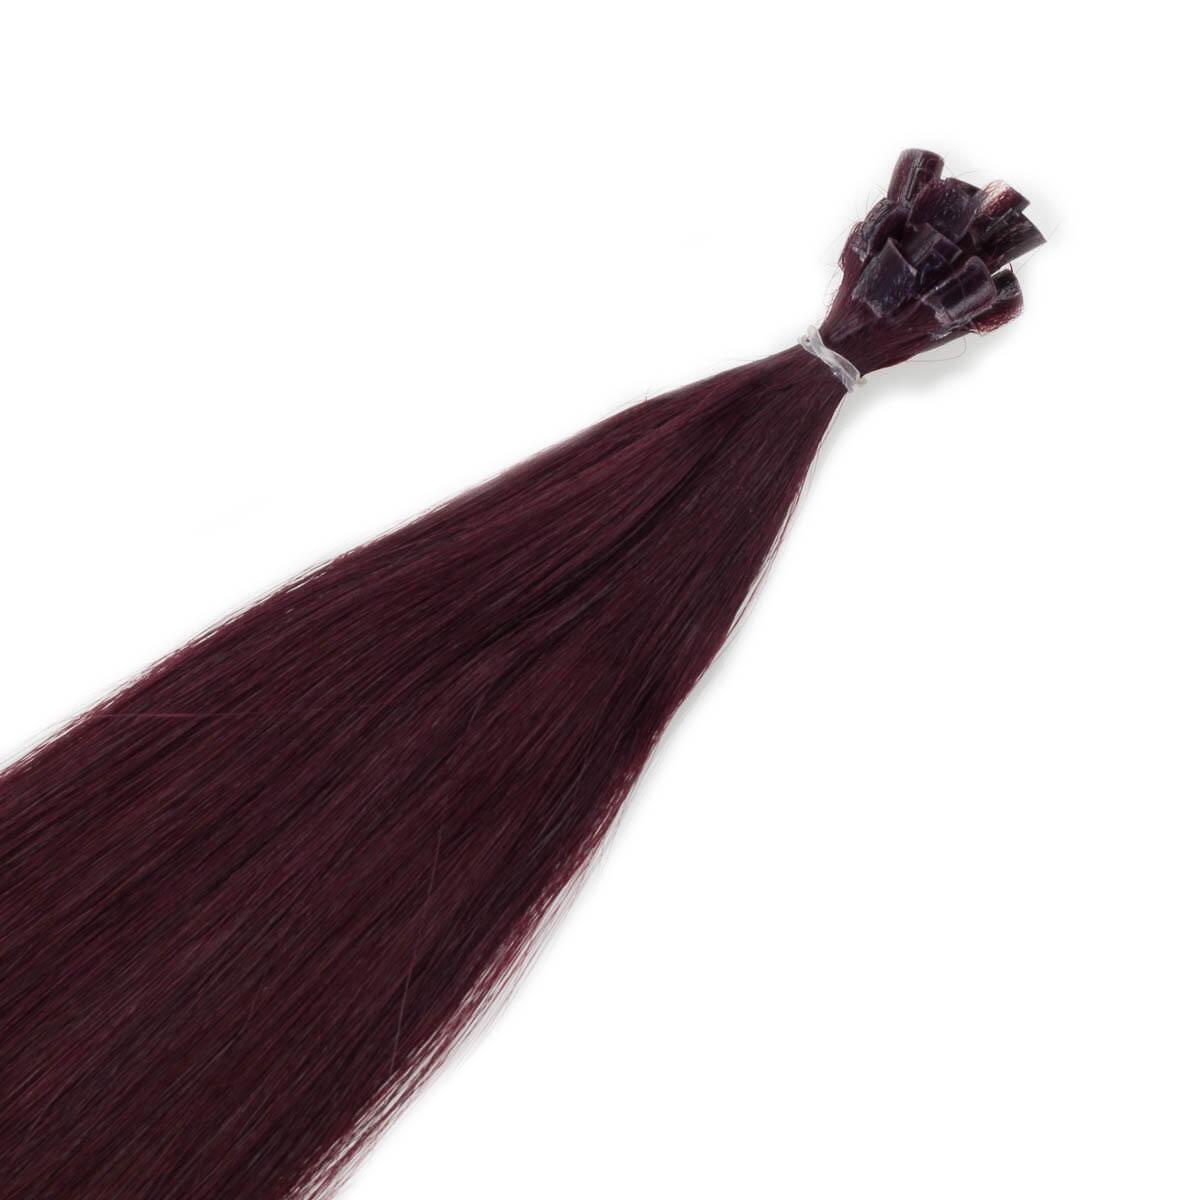 Nail Hair Original 6.12 Dark Mahogany Brown 40 cm